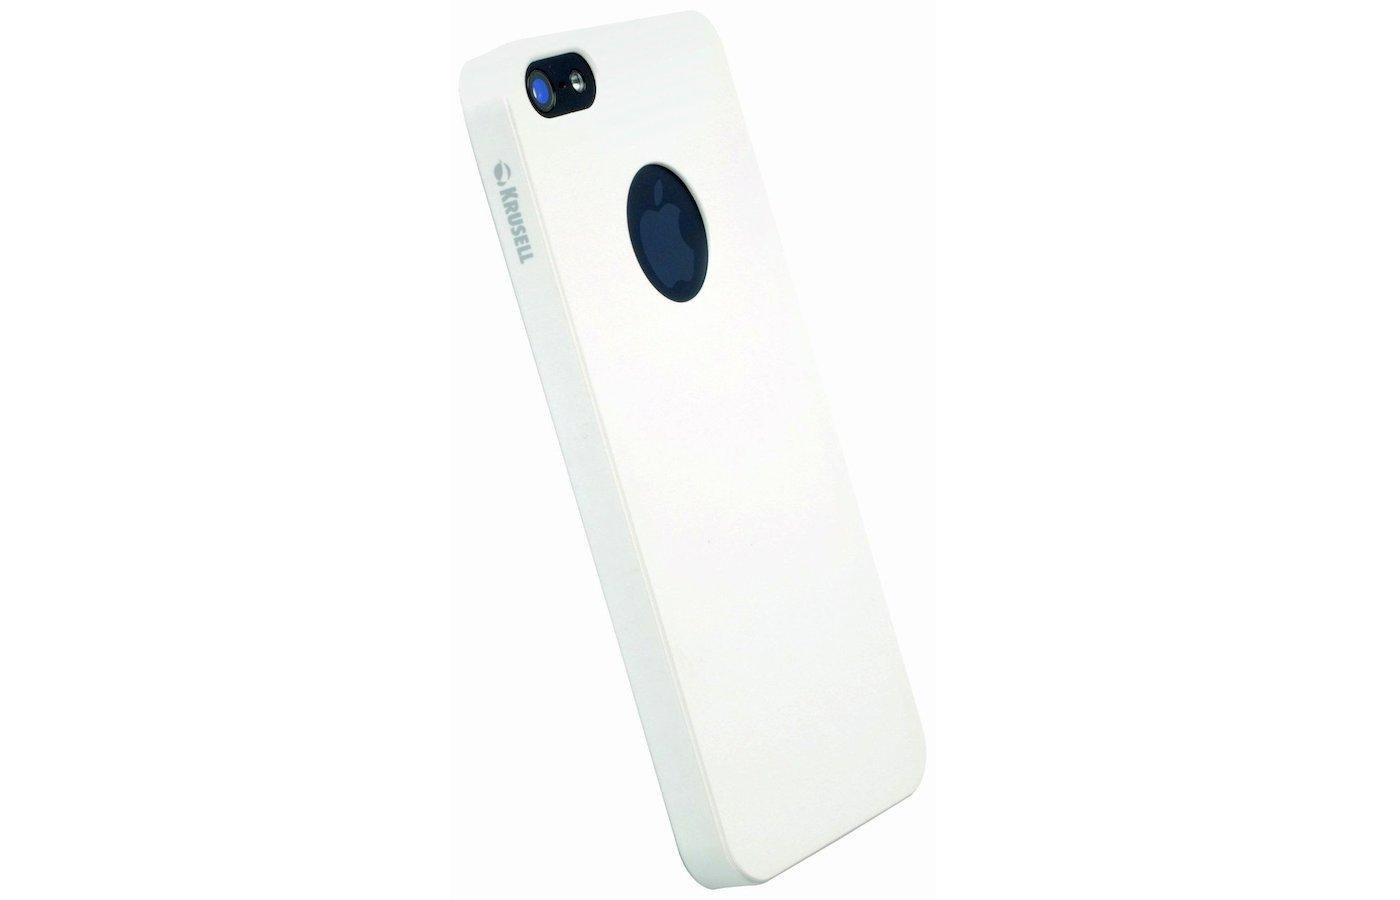 Чехол KRUSELL ColorCover для iPhone 5/5S/SE White Metallic (KS-89731)